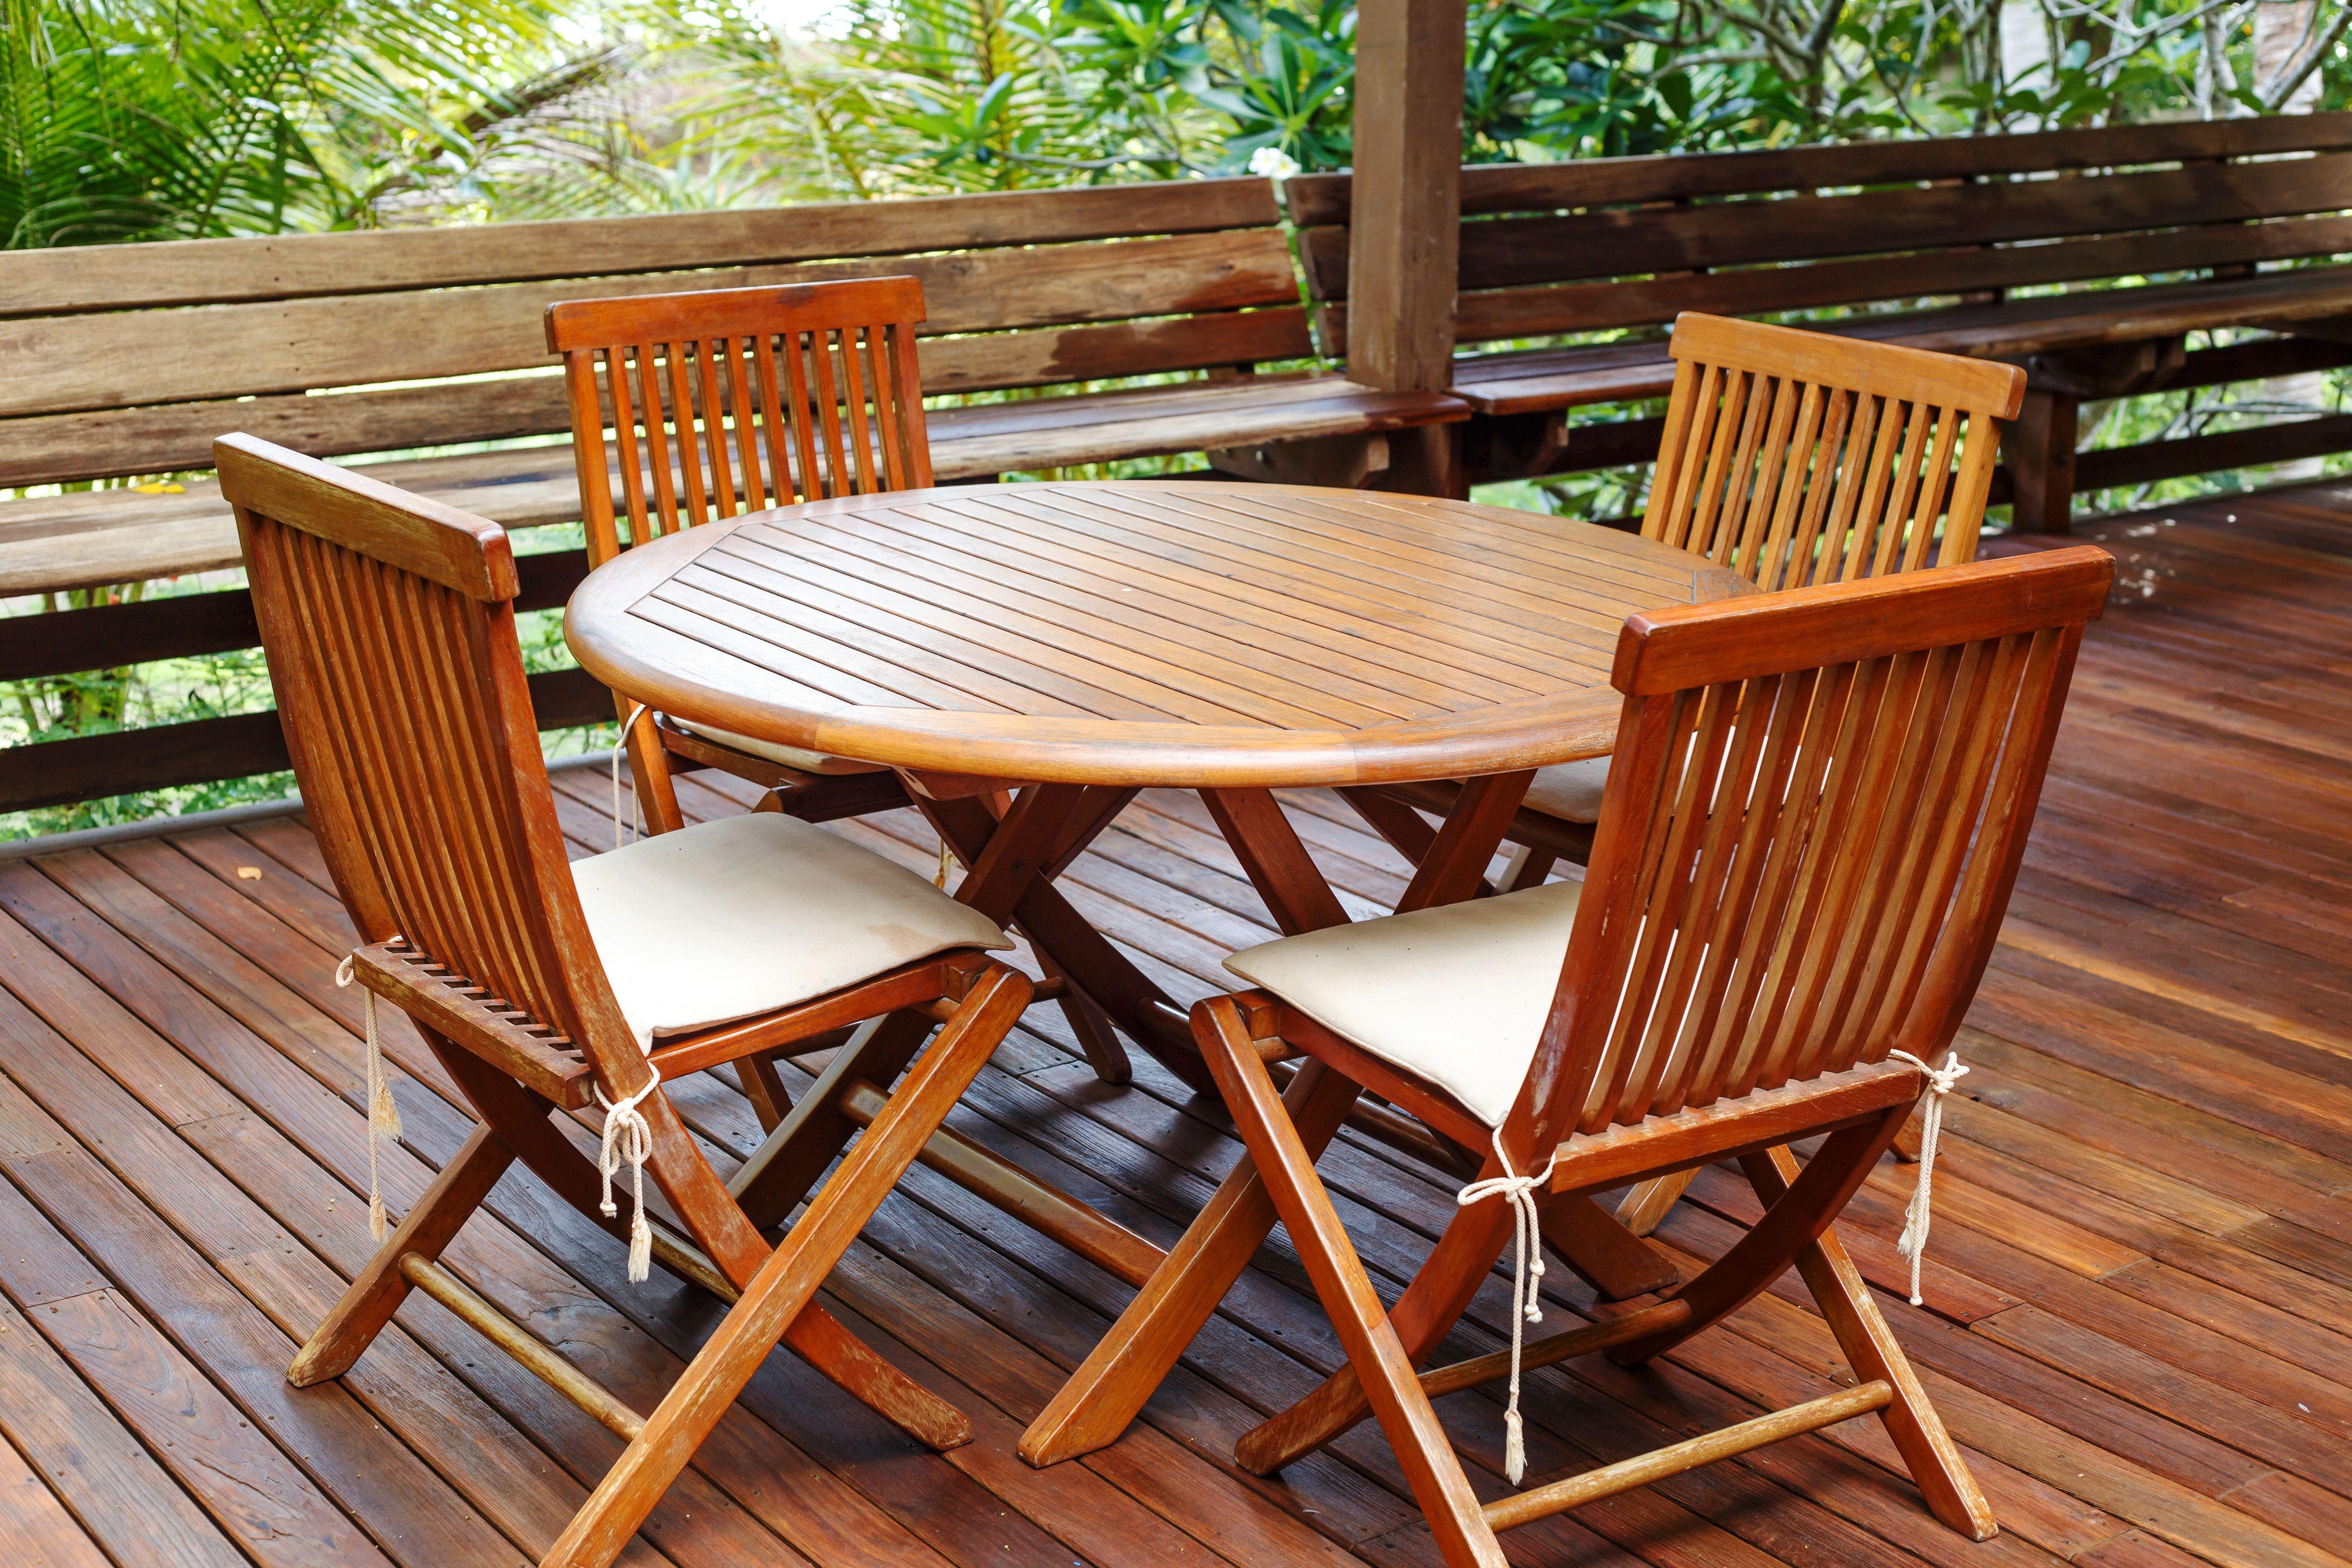 Teak Garden Furniture How To Stain Teak Furniture Teakgarden Furniture Teak Furniture Teak Outdoor Furniture Patio Flooring